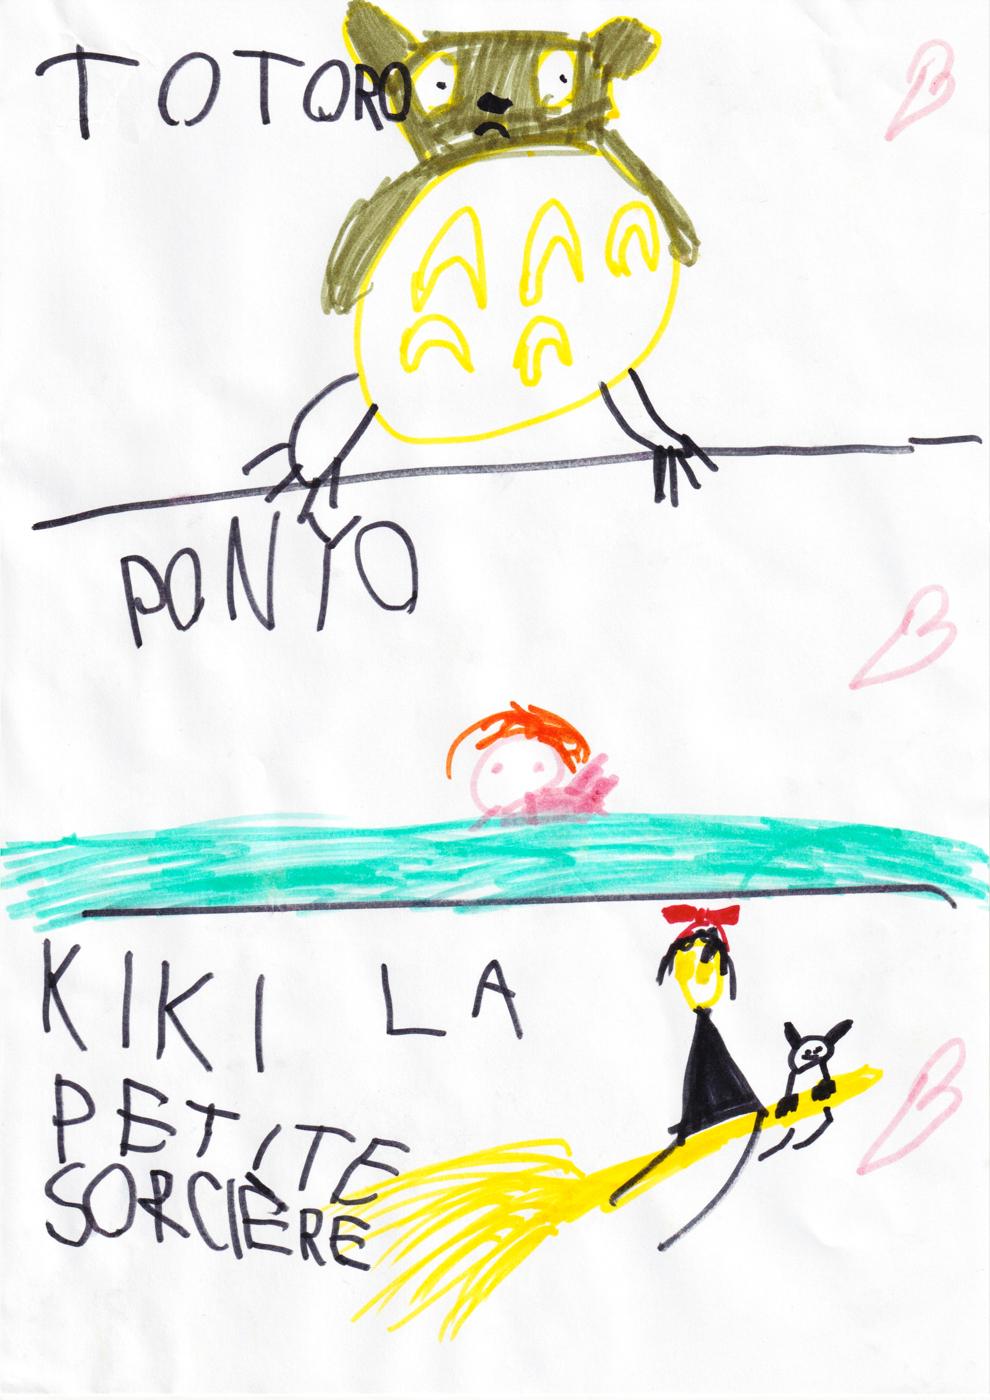 totoro ponyo kiki